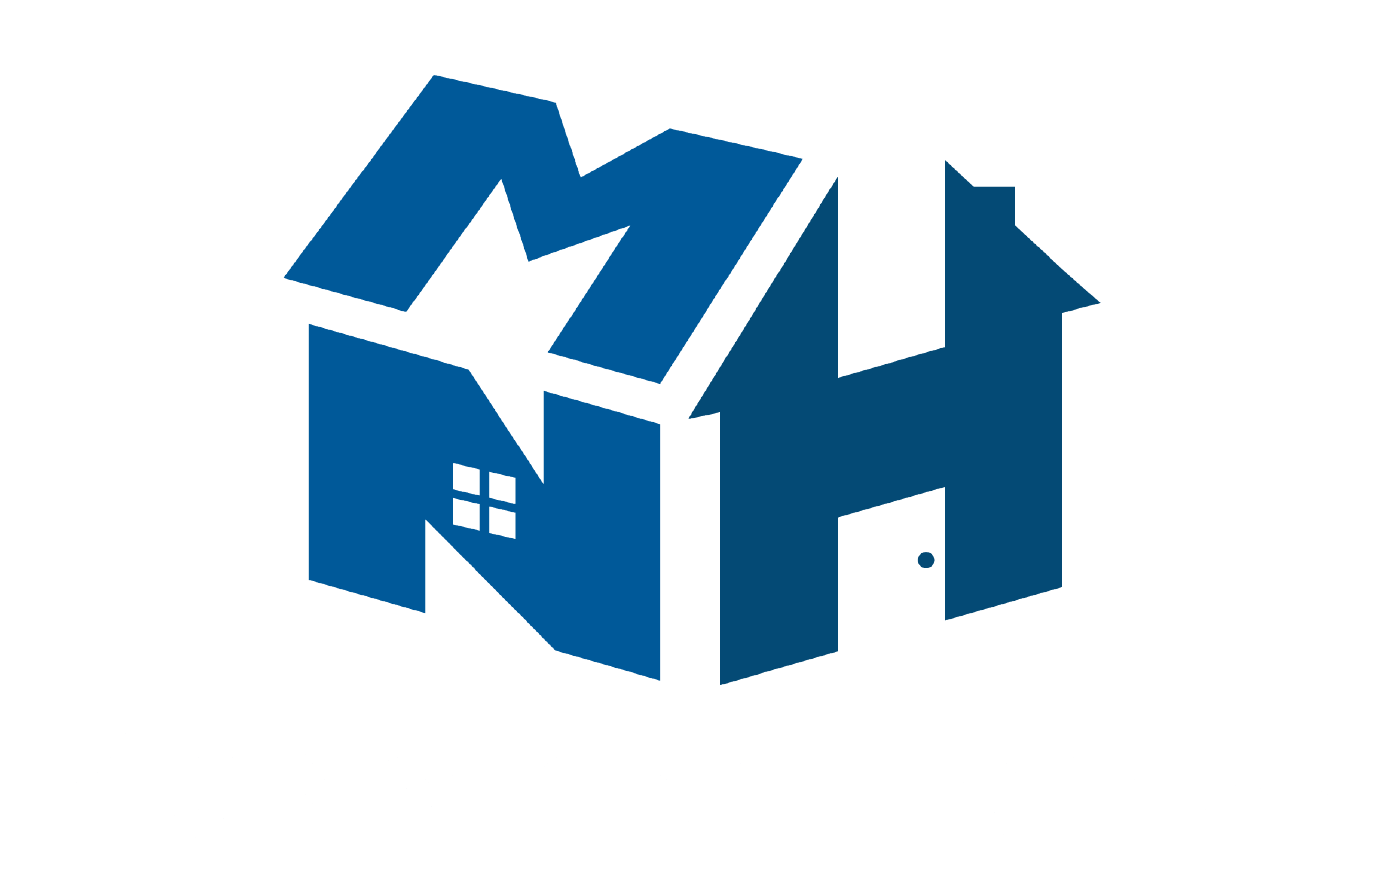 McNamer Homes